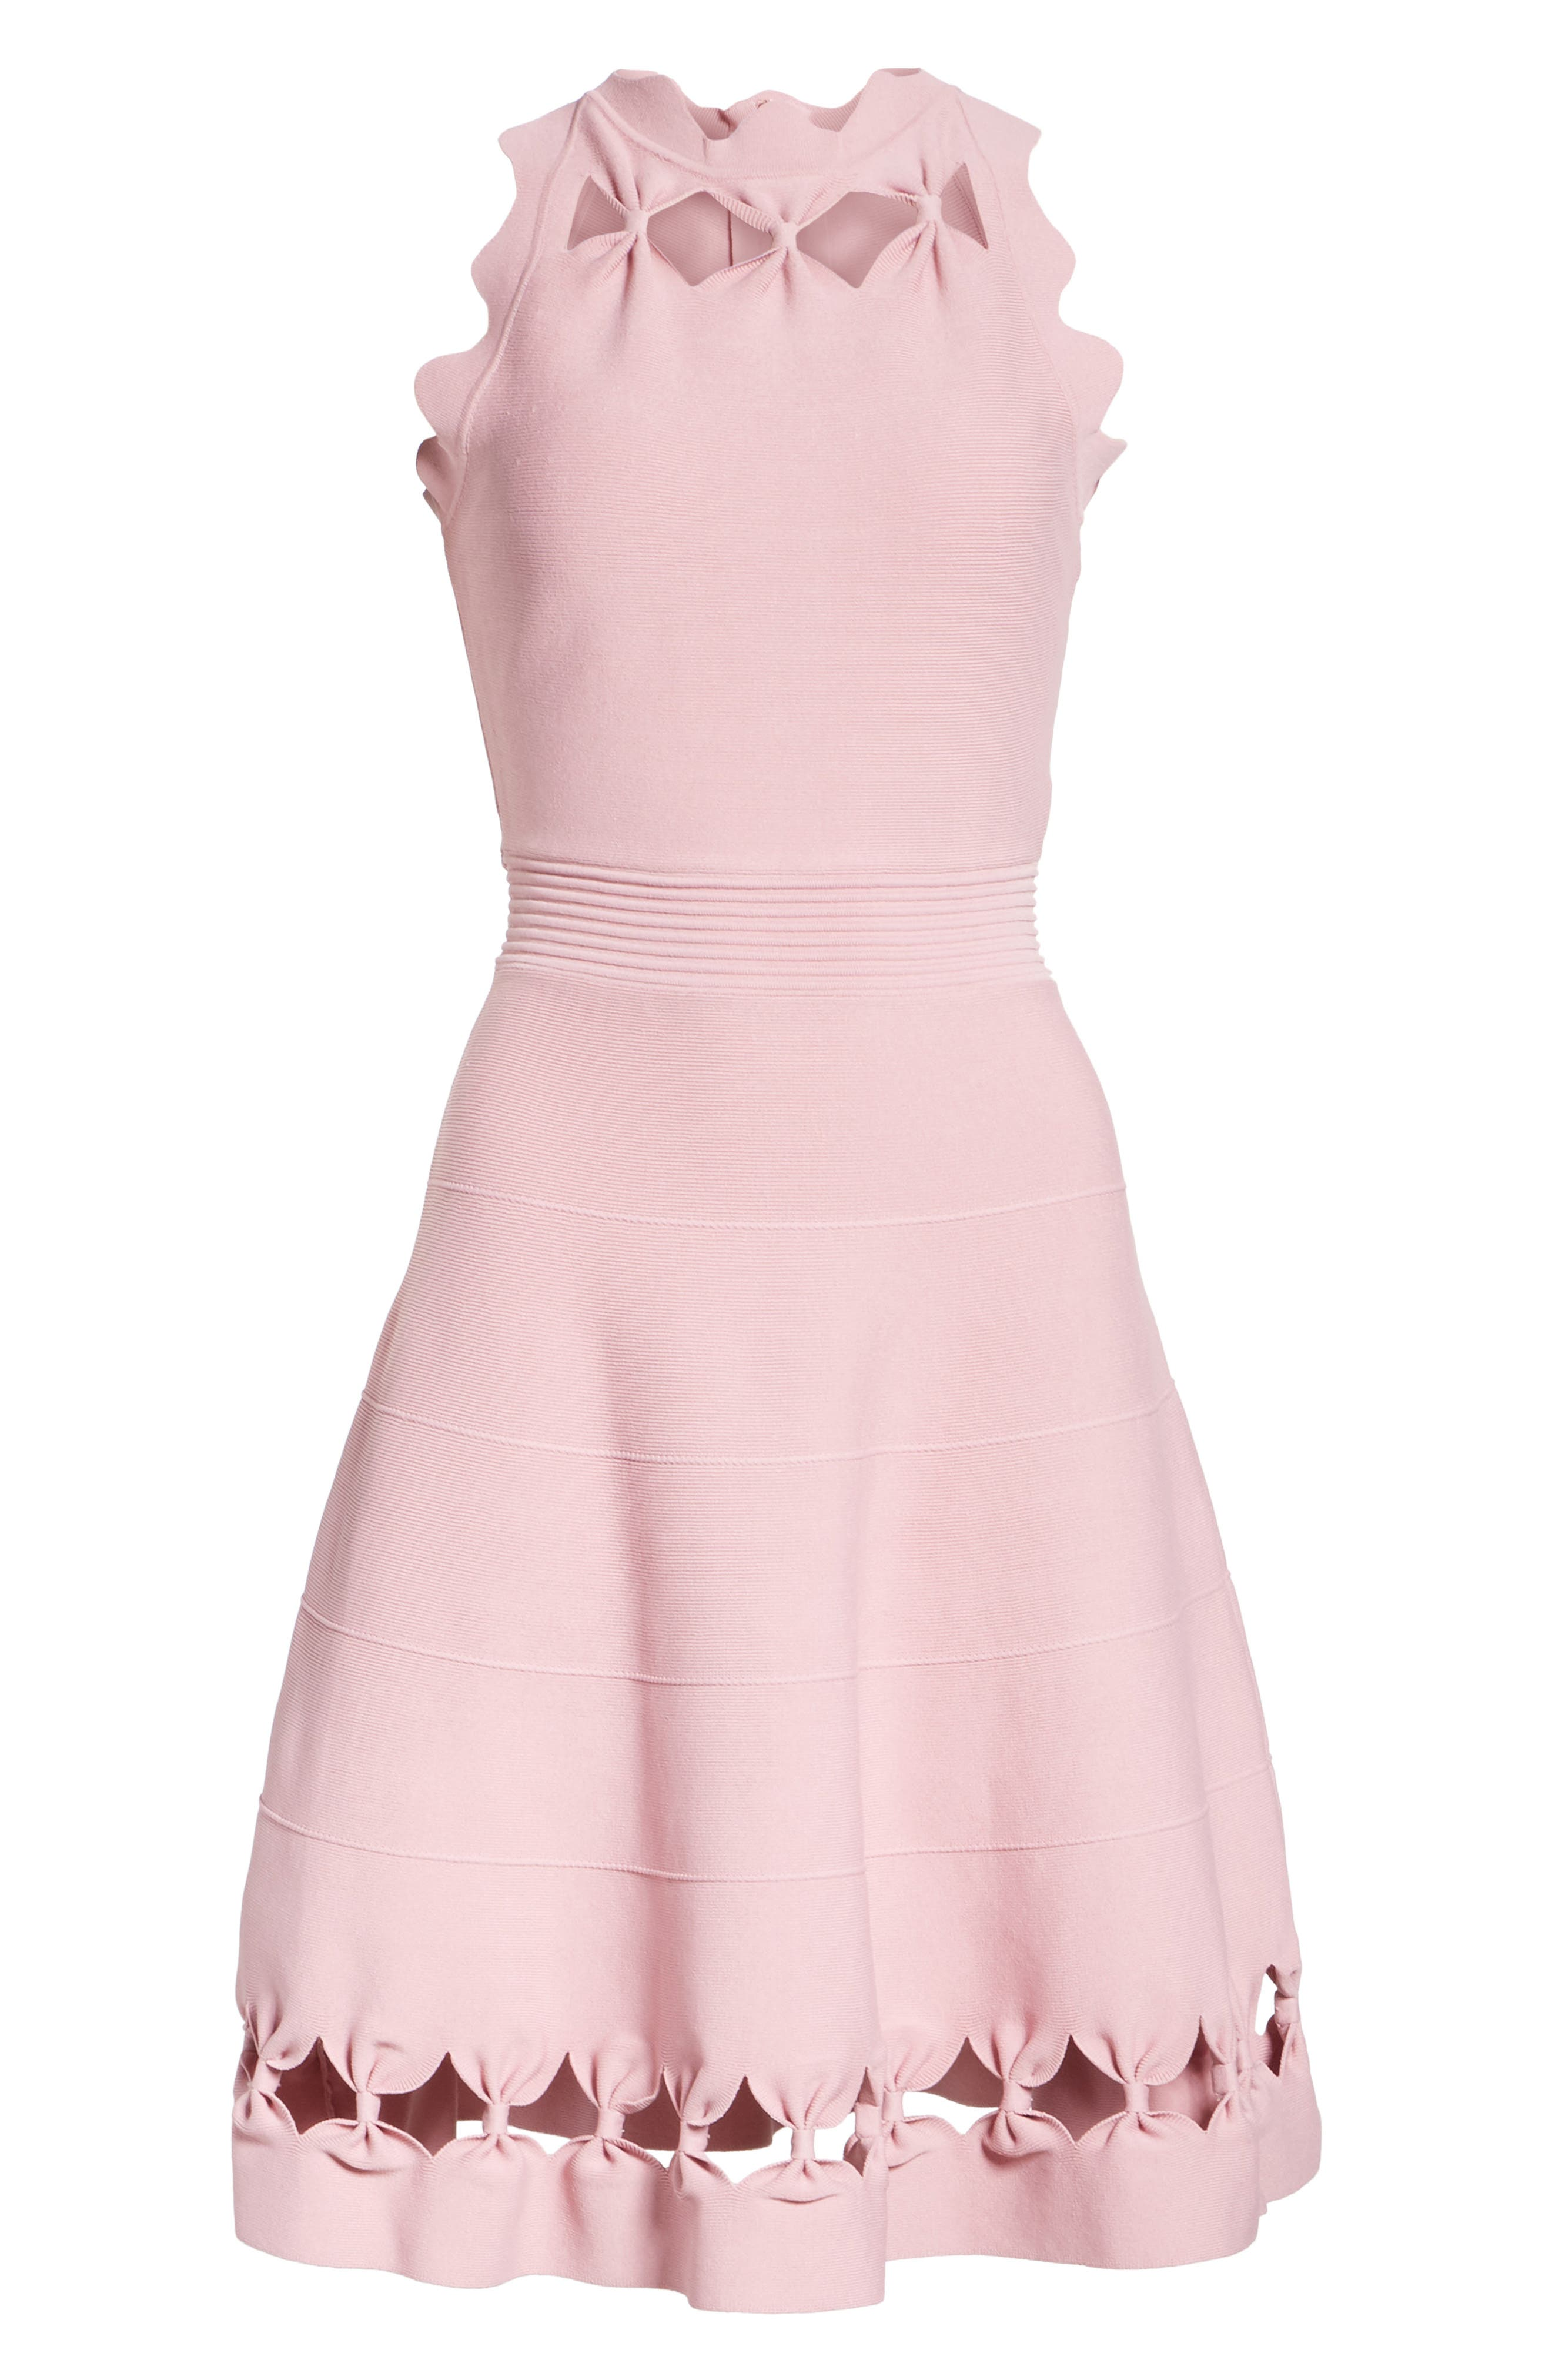 Bow Detail Knit Fit & Flare Dress,                             Alternate thumbnail 7, color,